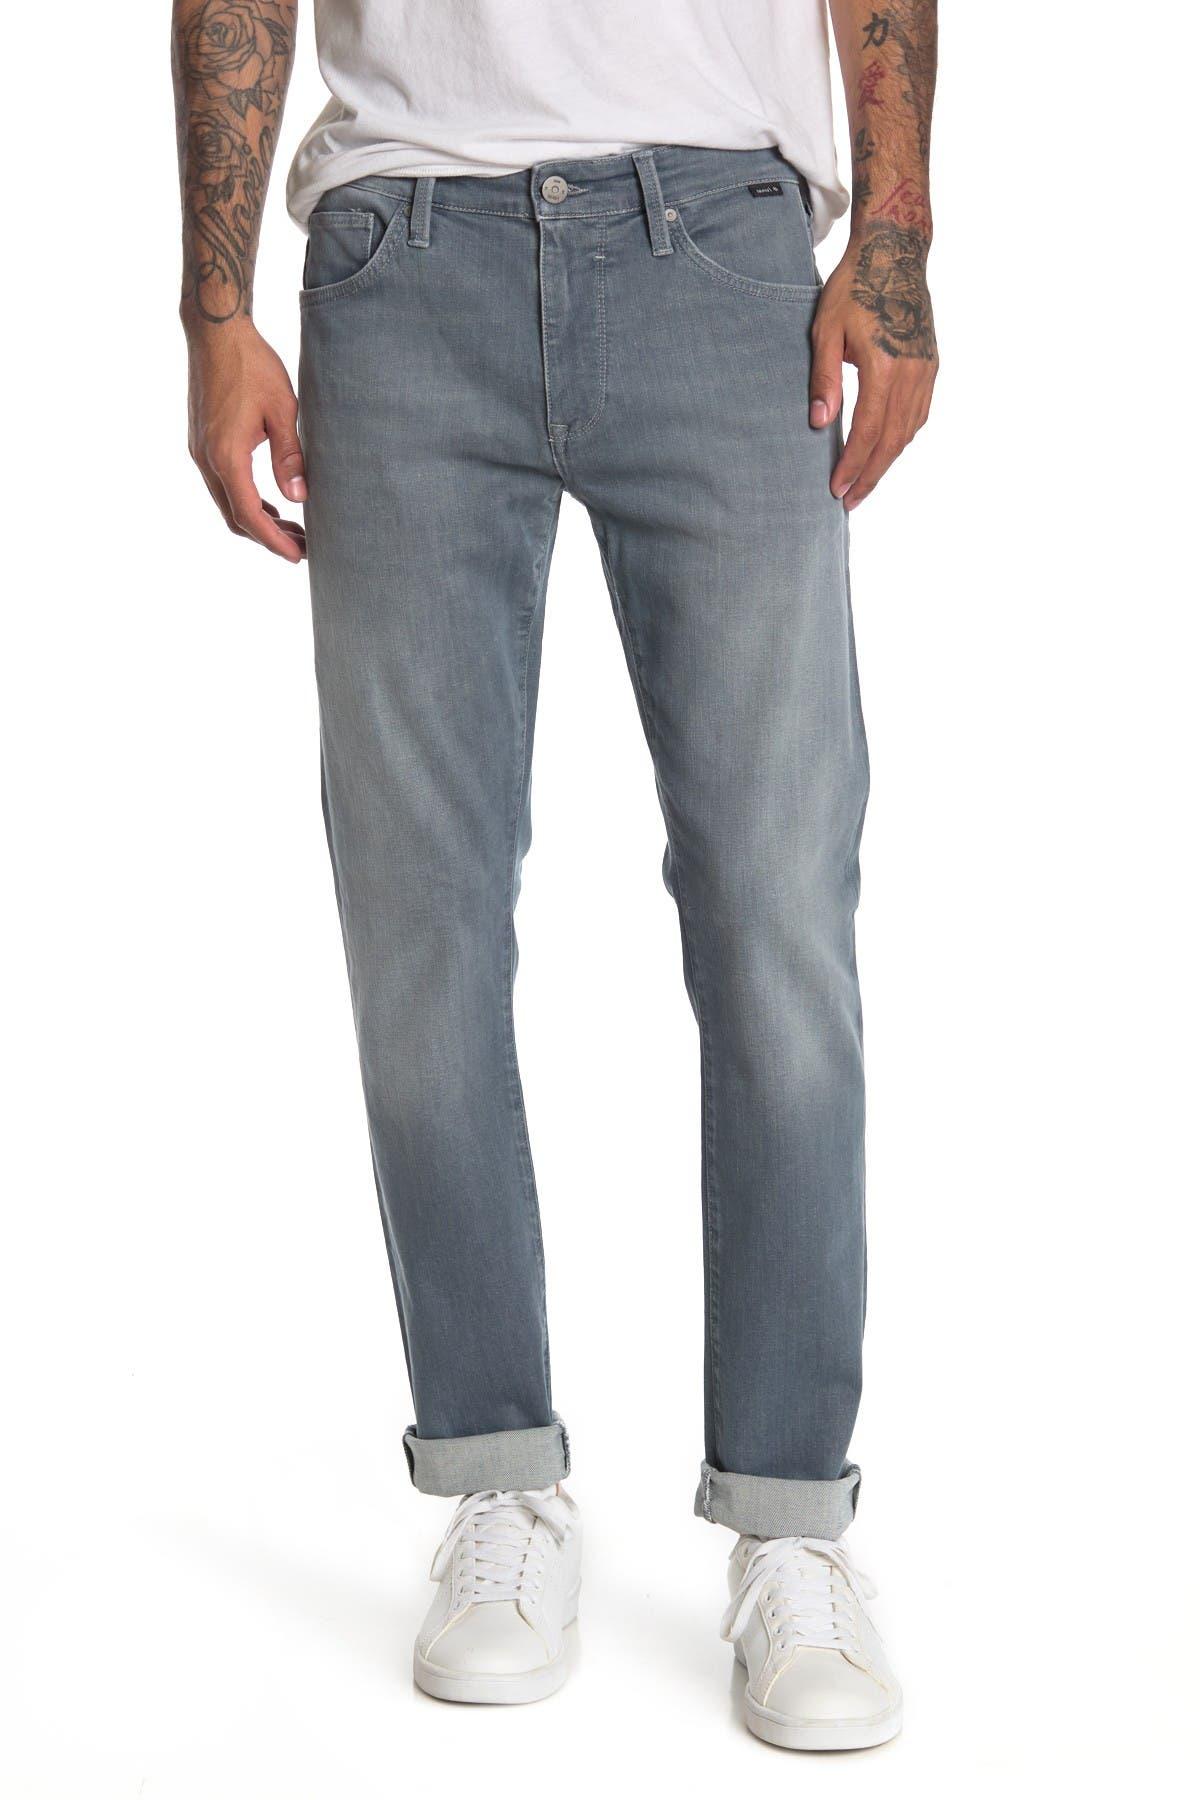 Image of Mavi Jake Slim Fit Jeans